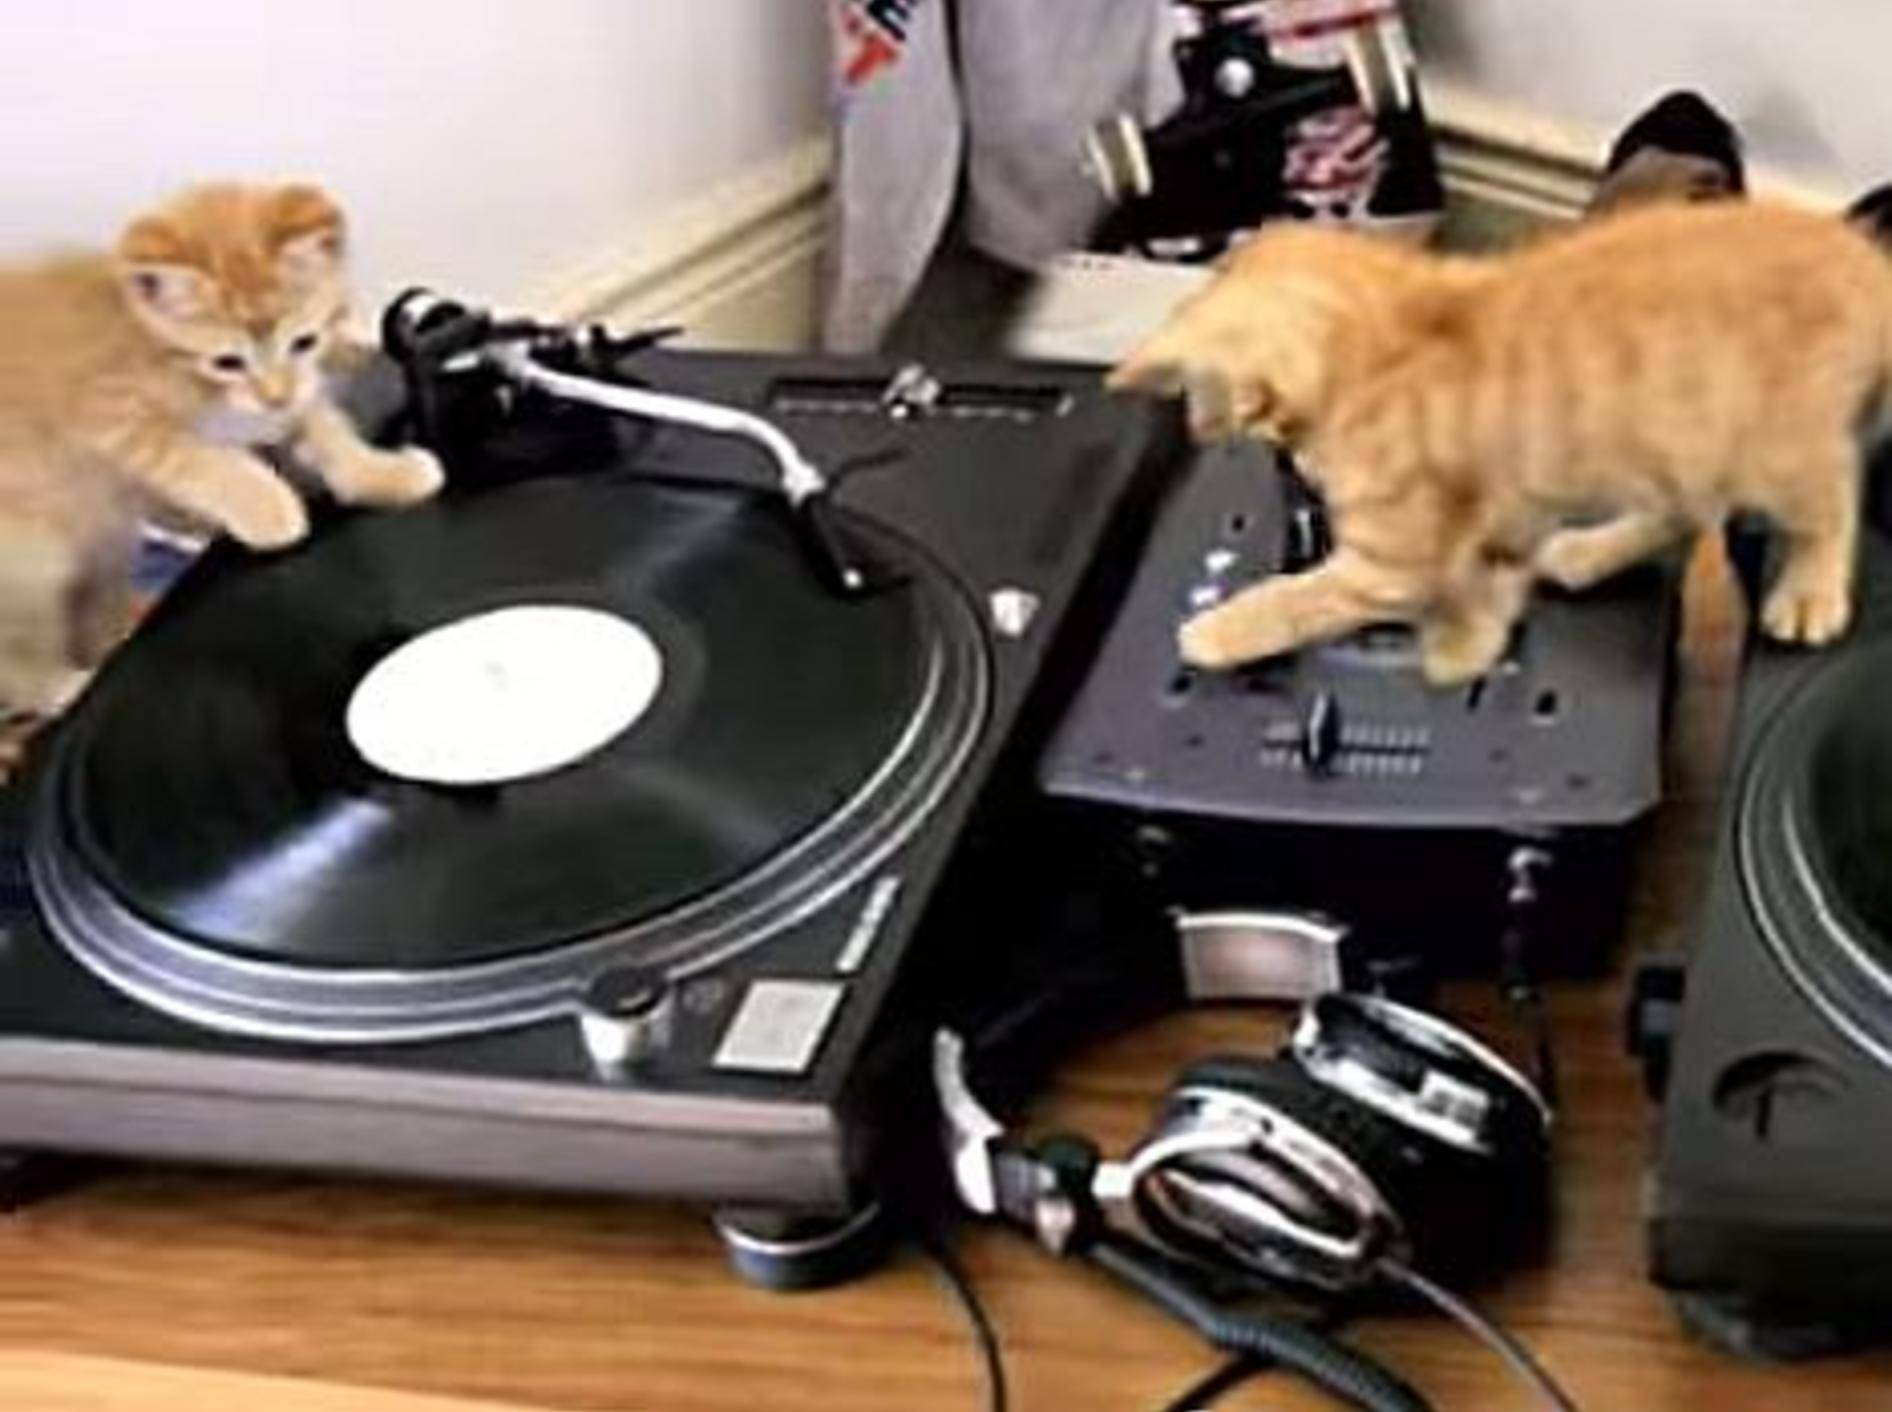 Süße Katzengang am DJ-Pult – Bild: Youtube / larsen161